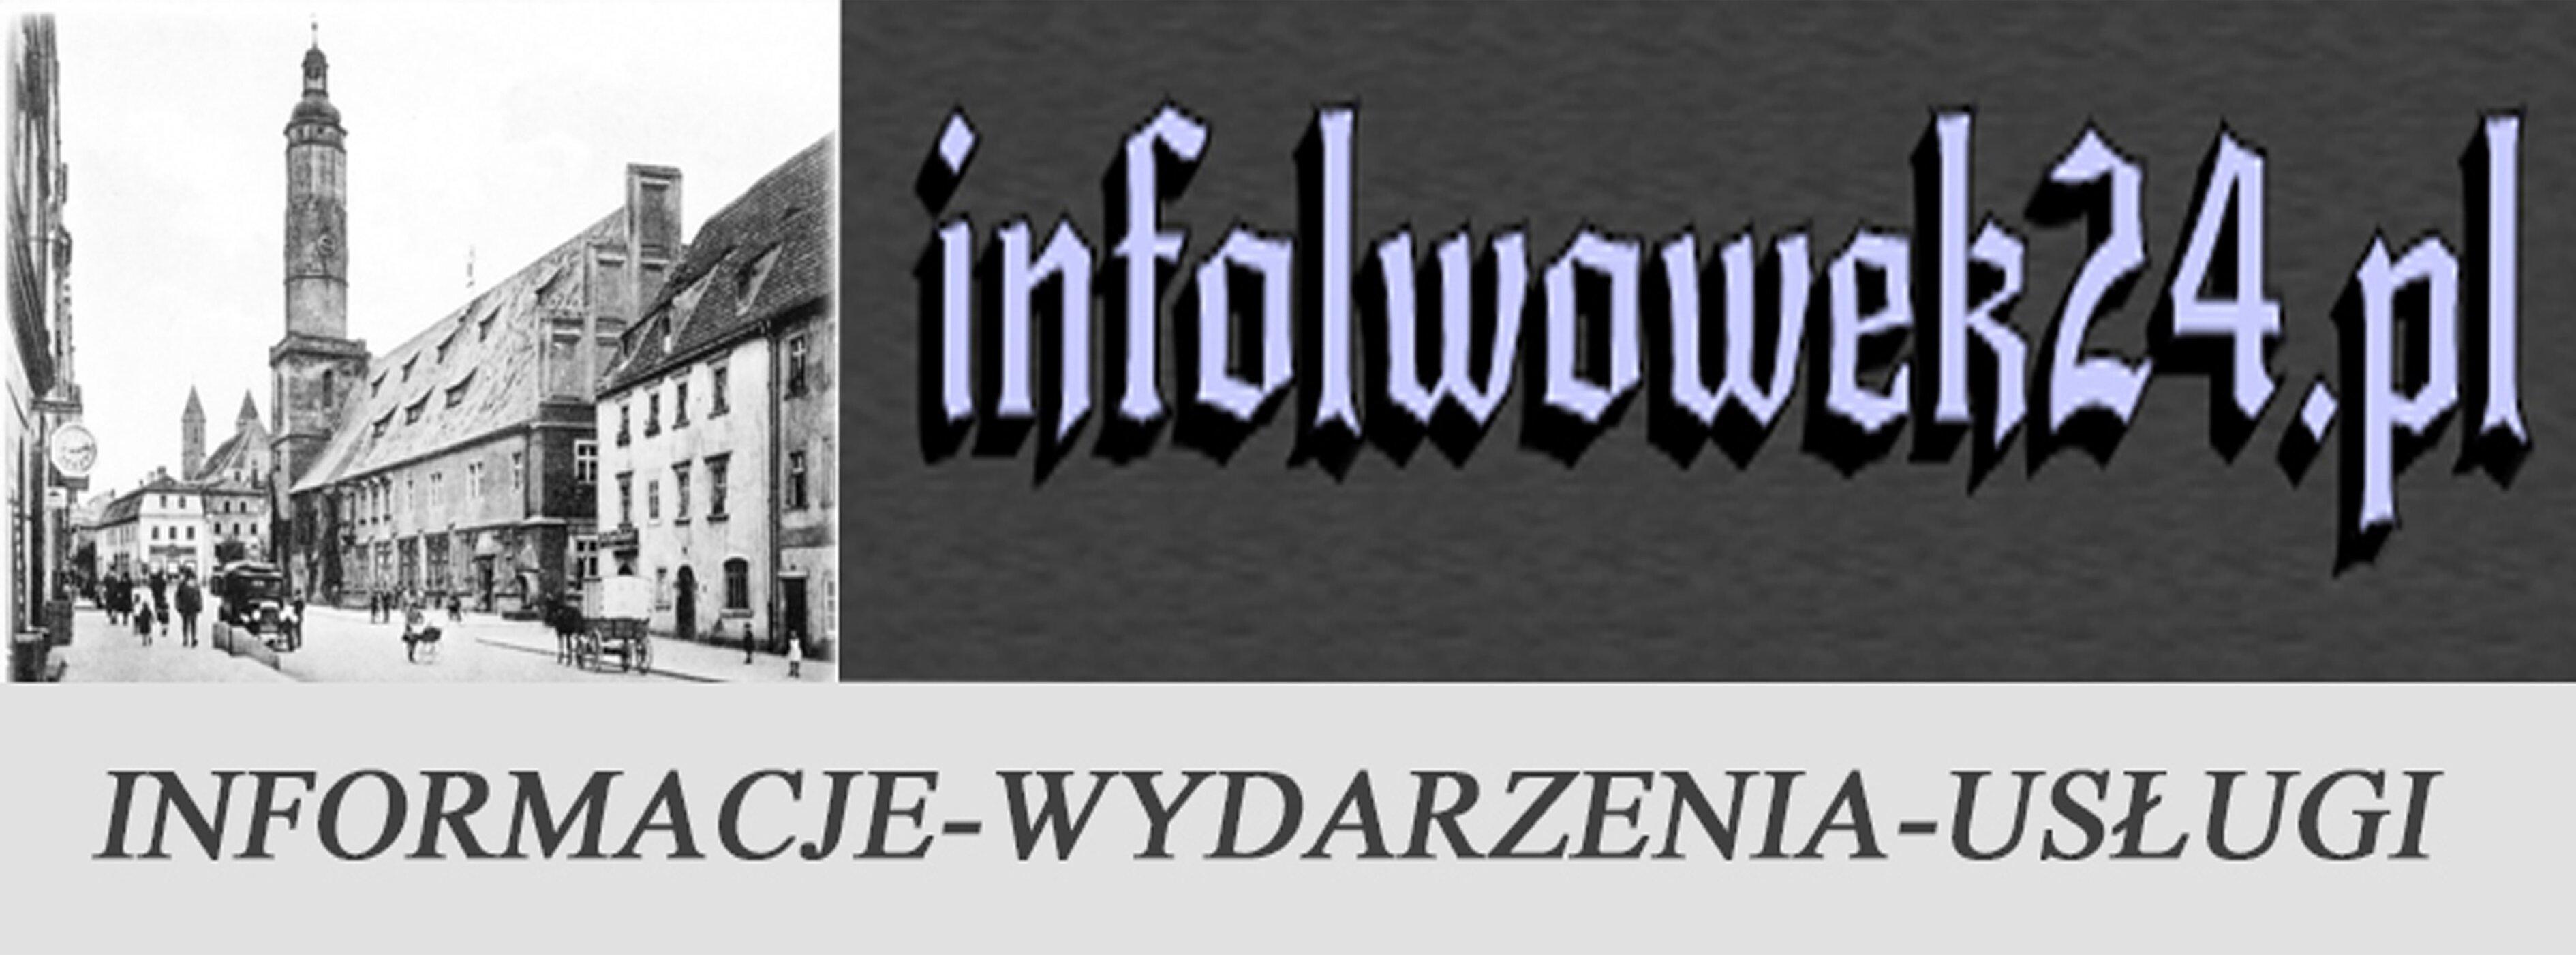 infolwowek24.pl